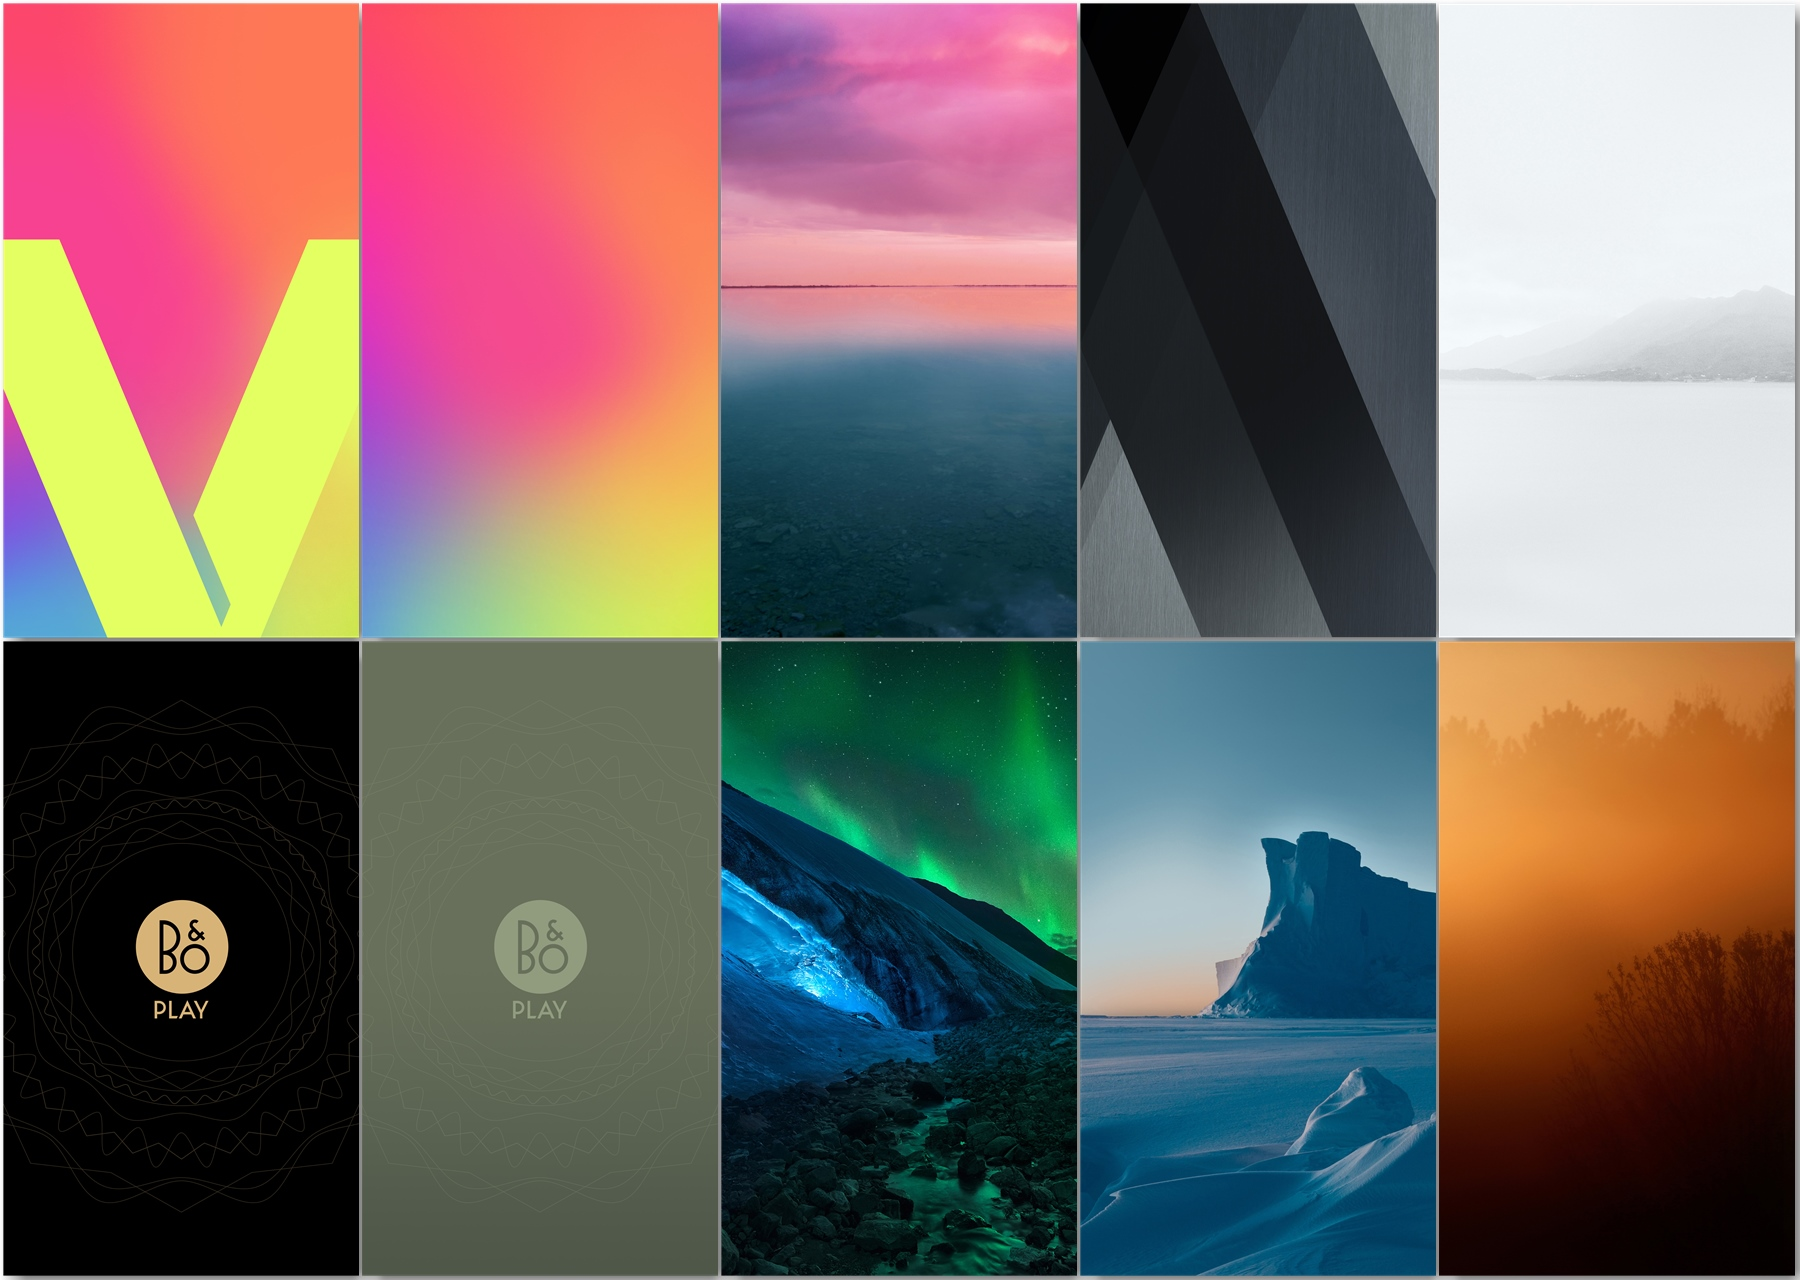 v20-wallsprv.jpg